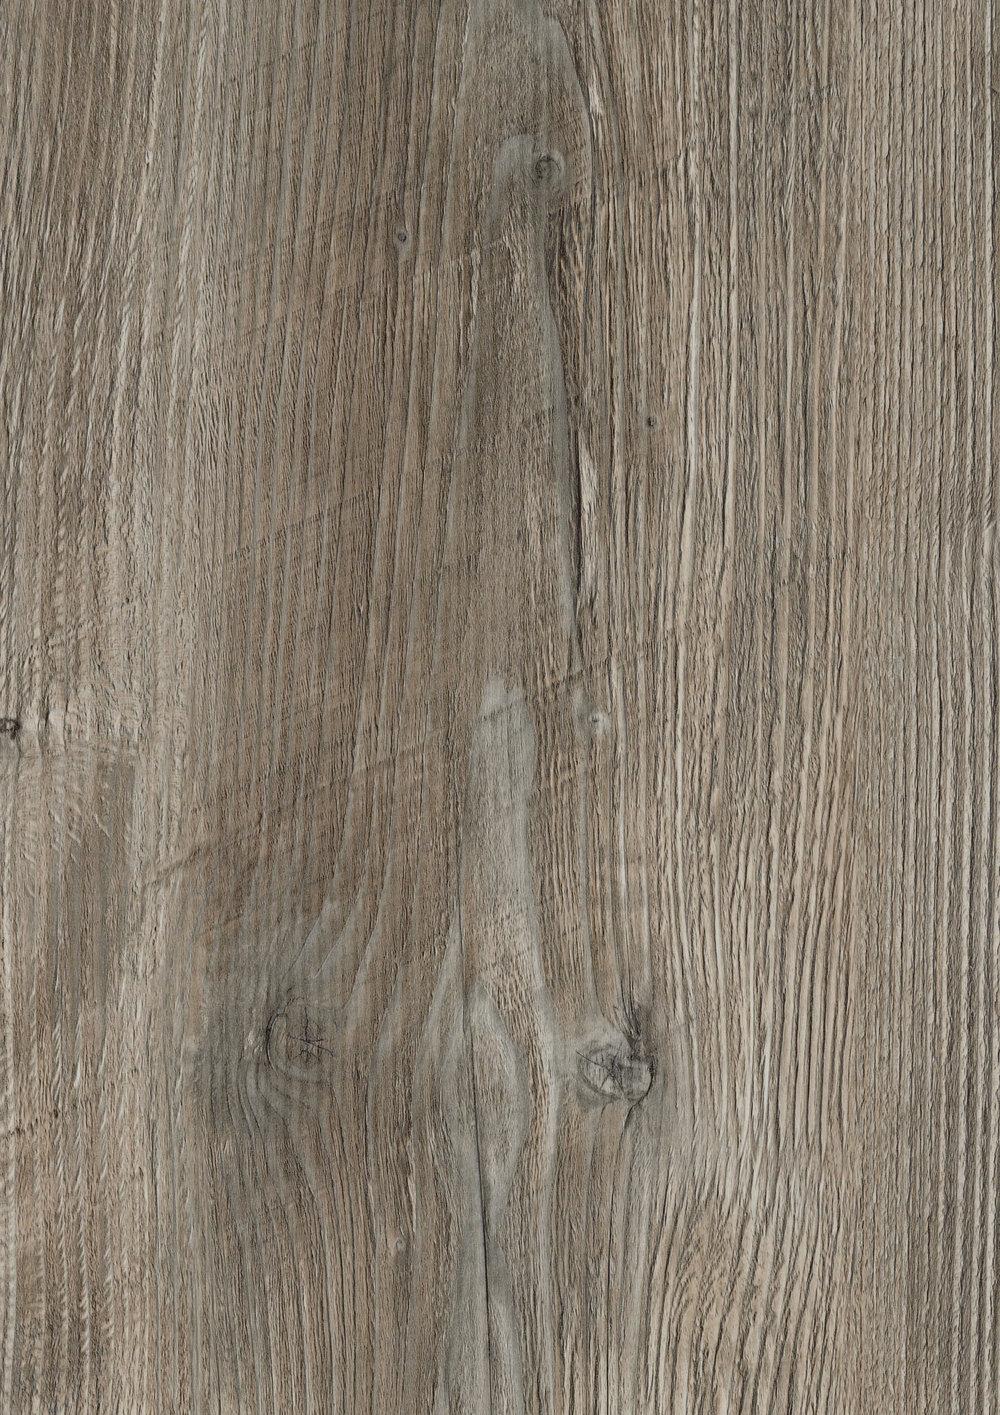 Ponderosa Pine R55004 RT